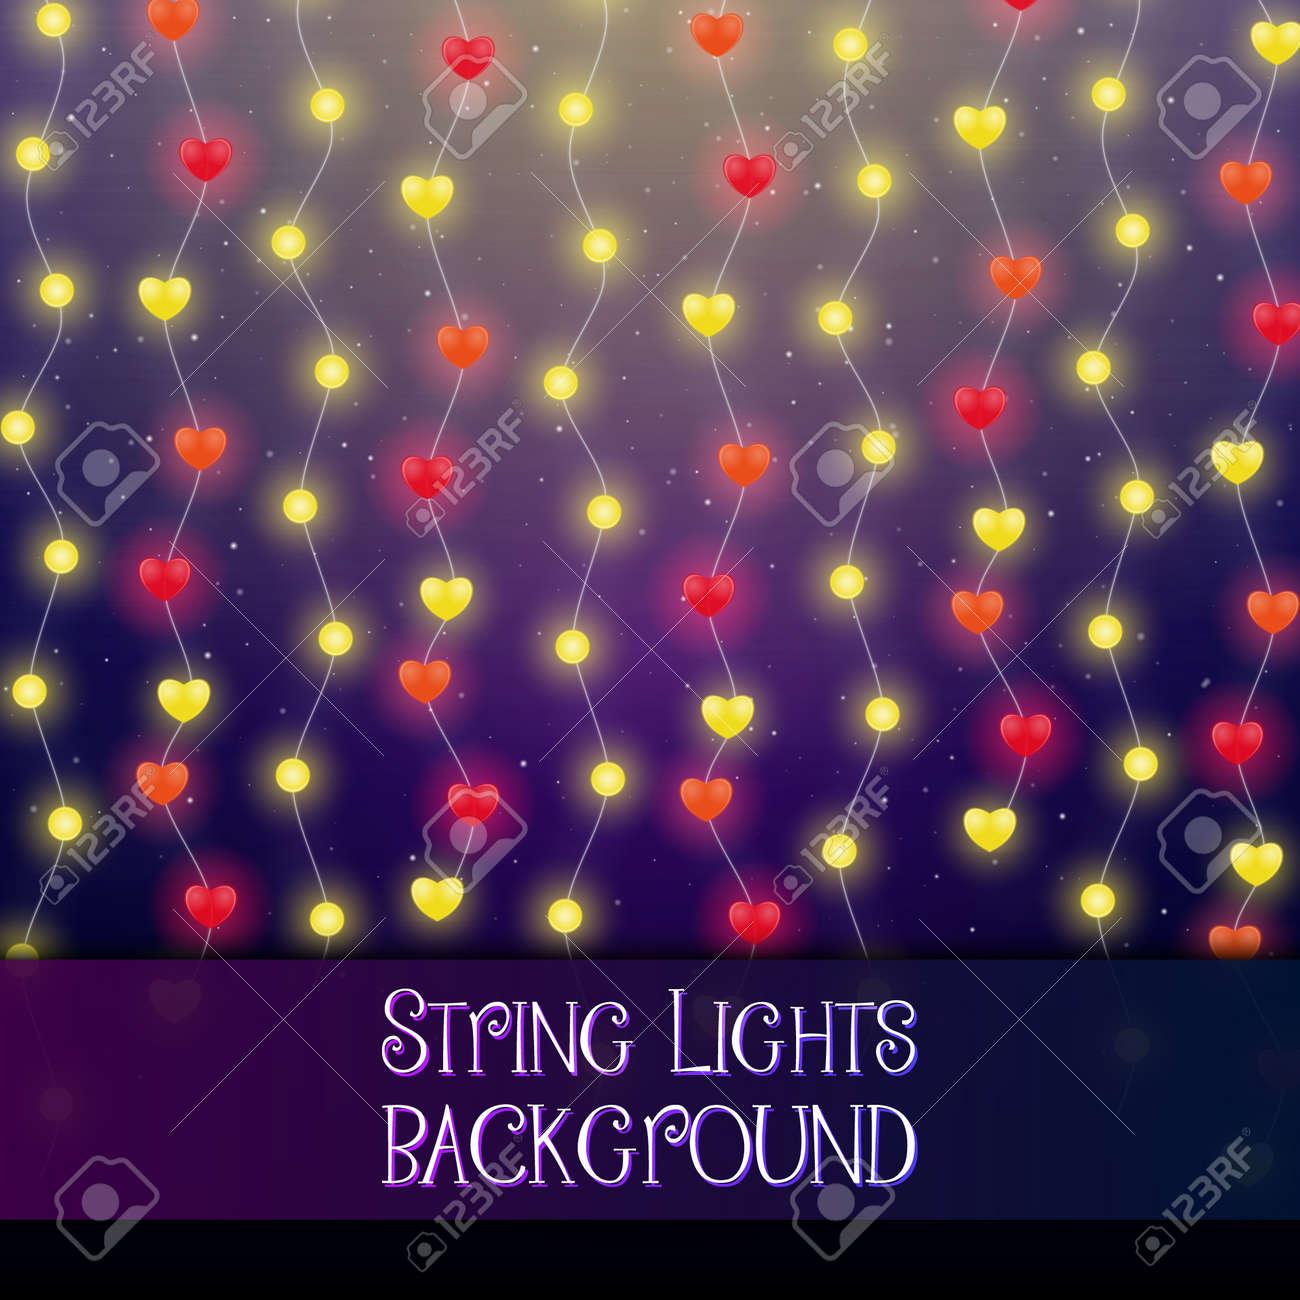 Dark background with decorative string lights. Bright shining light bulbs garlands - 114806871